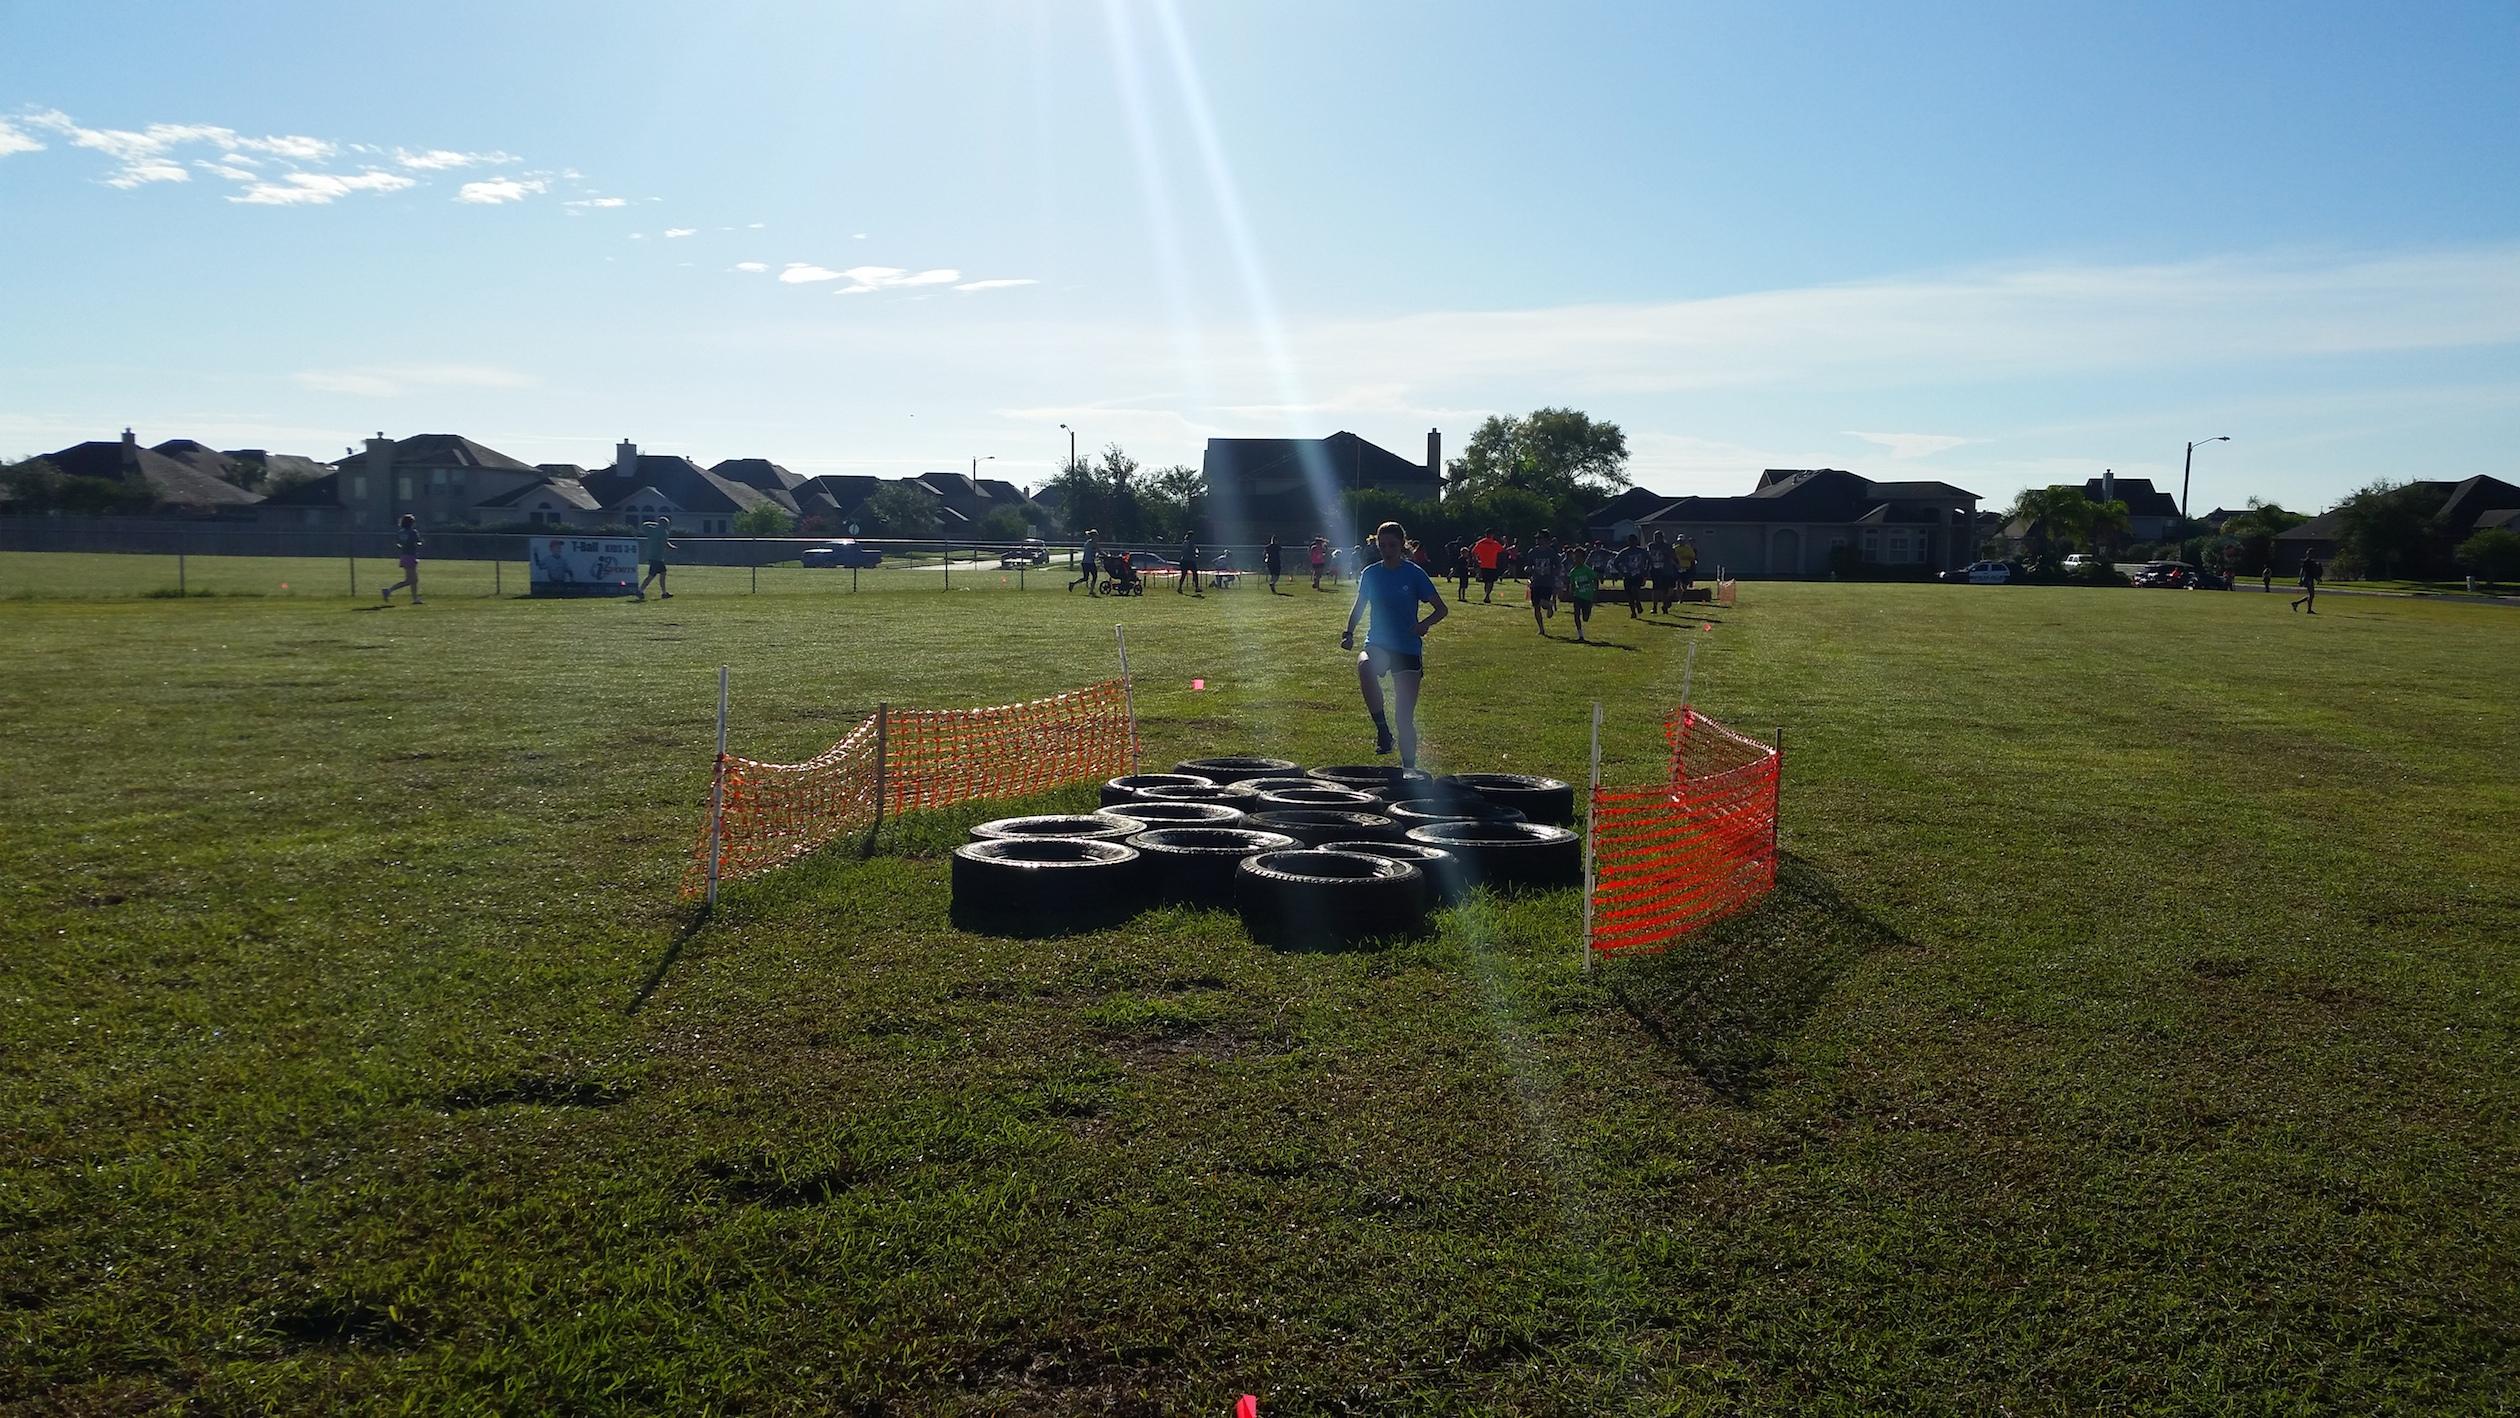 King's challenge 5k tire run